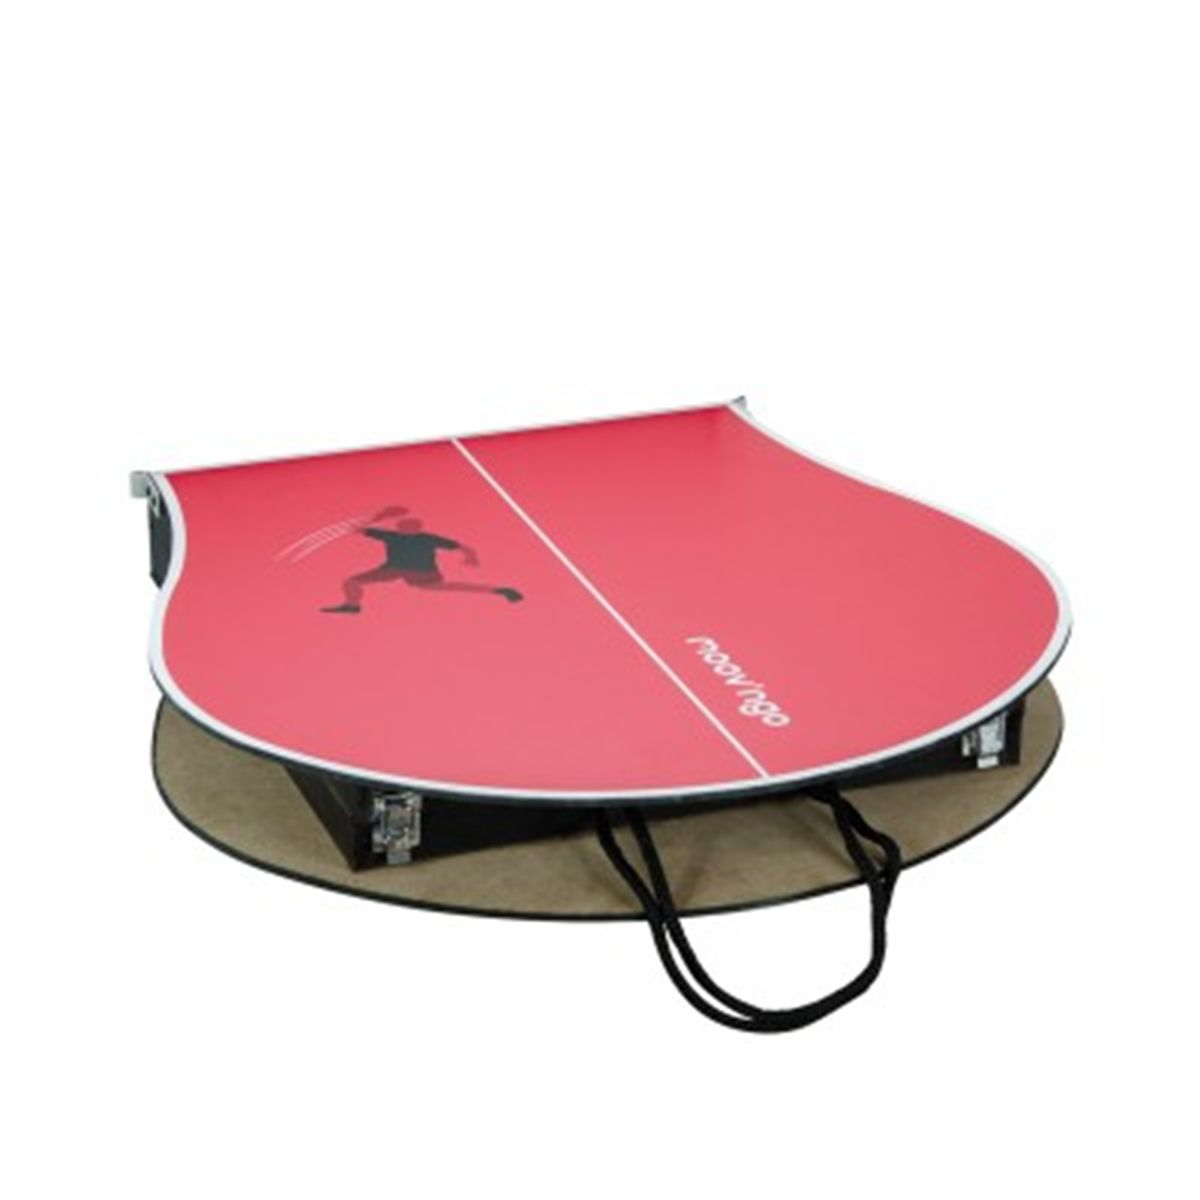 Table De Ping Pong Transformable table de ping pong pliable